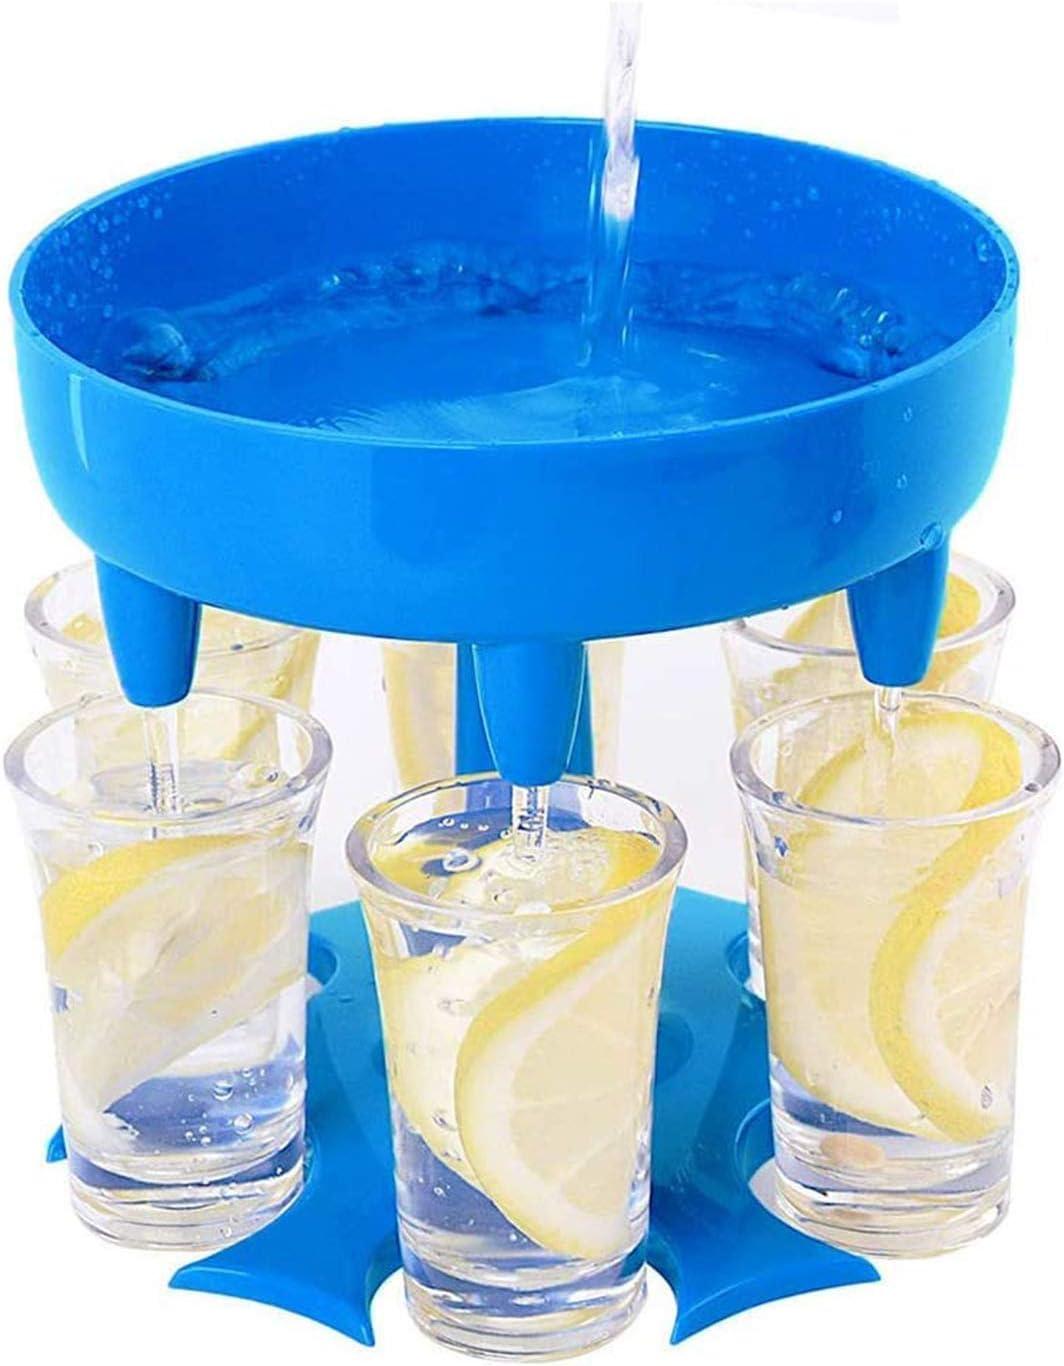 6 Shot Glass Dispenser, Holder Stand Rack with 6 Shot Glasses Silicone Plug, Multiple Bar Cocktail Shot Dispenser, Carrier Liquor Drinking Games Wine Dispenser Gifts for Parties, Carnival